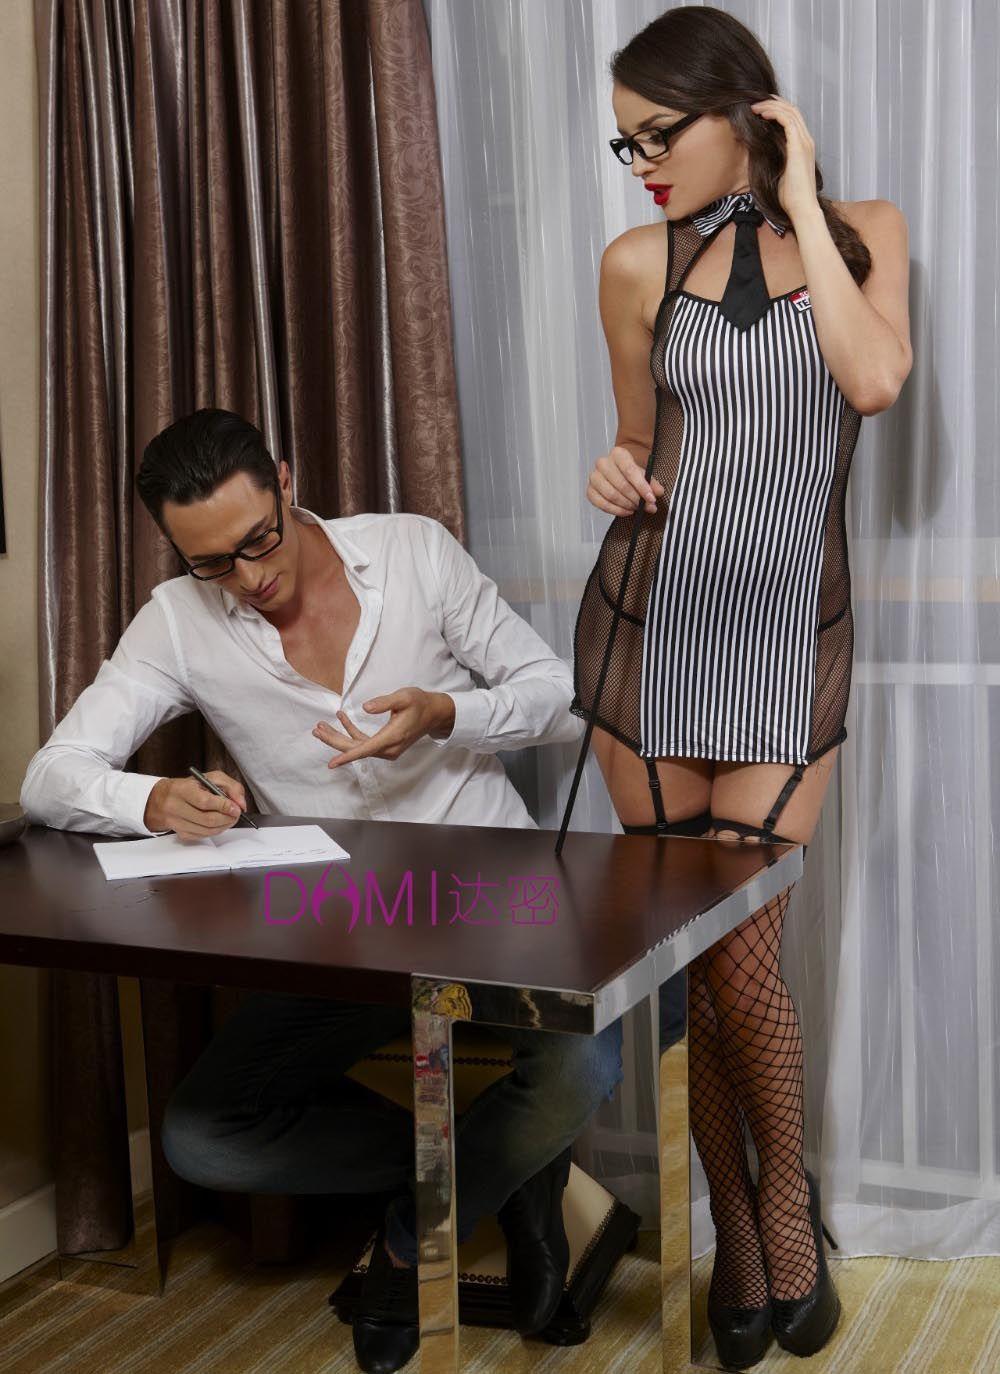 Idarmee S6230 Women Sexy Lingerie Hot Erotic Japanese High School Girl Cosplay Teacher Suits Erotic Lingerie